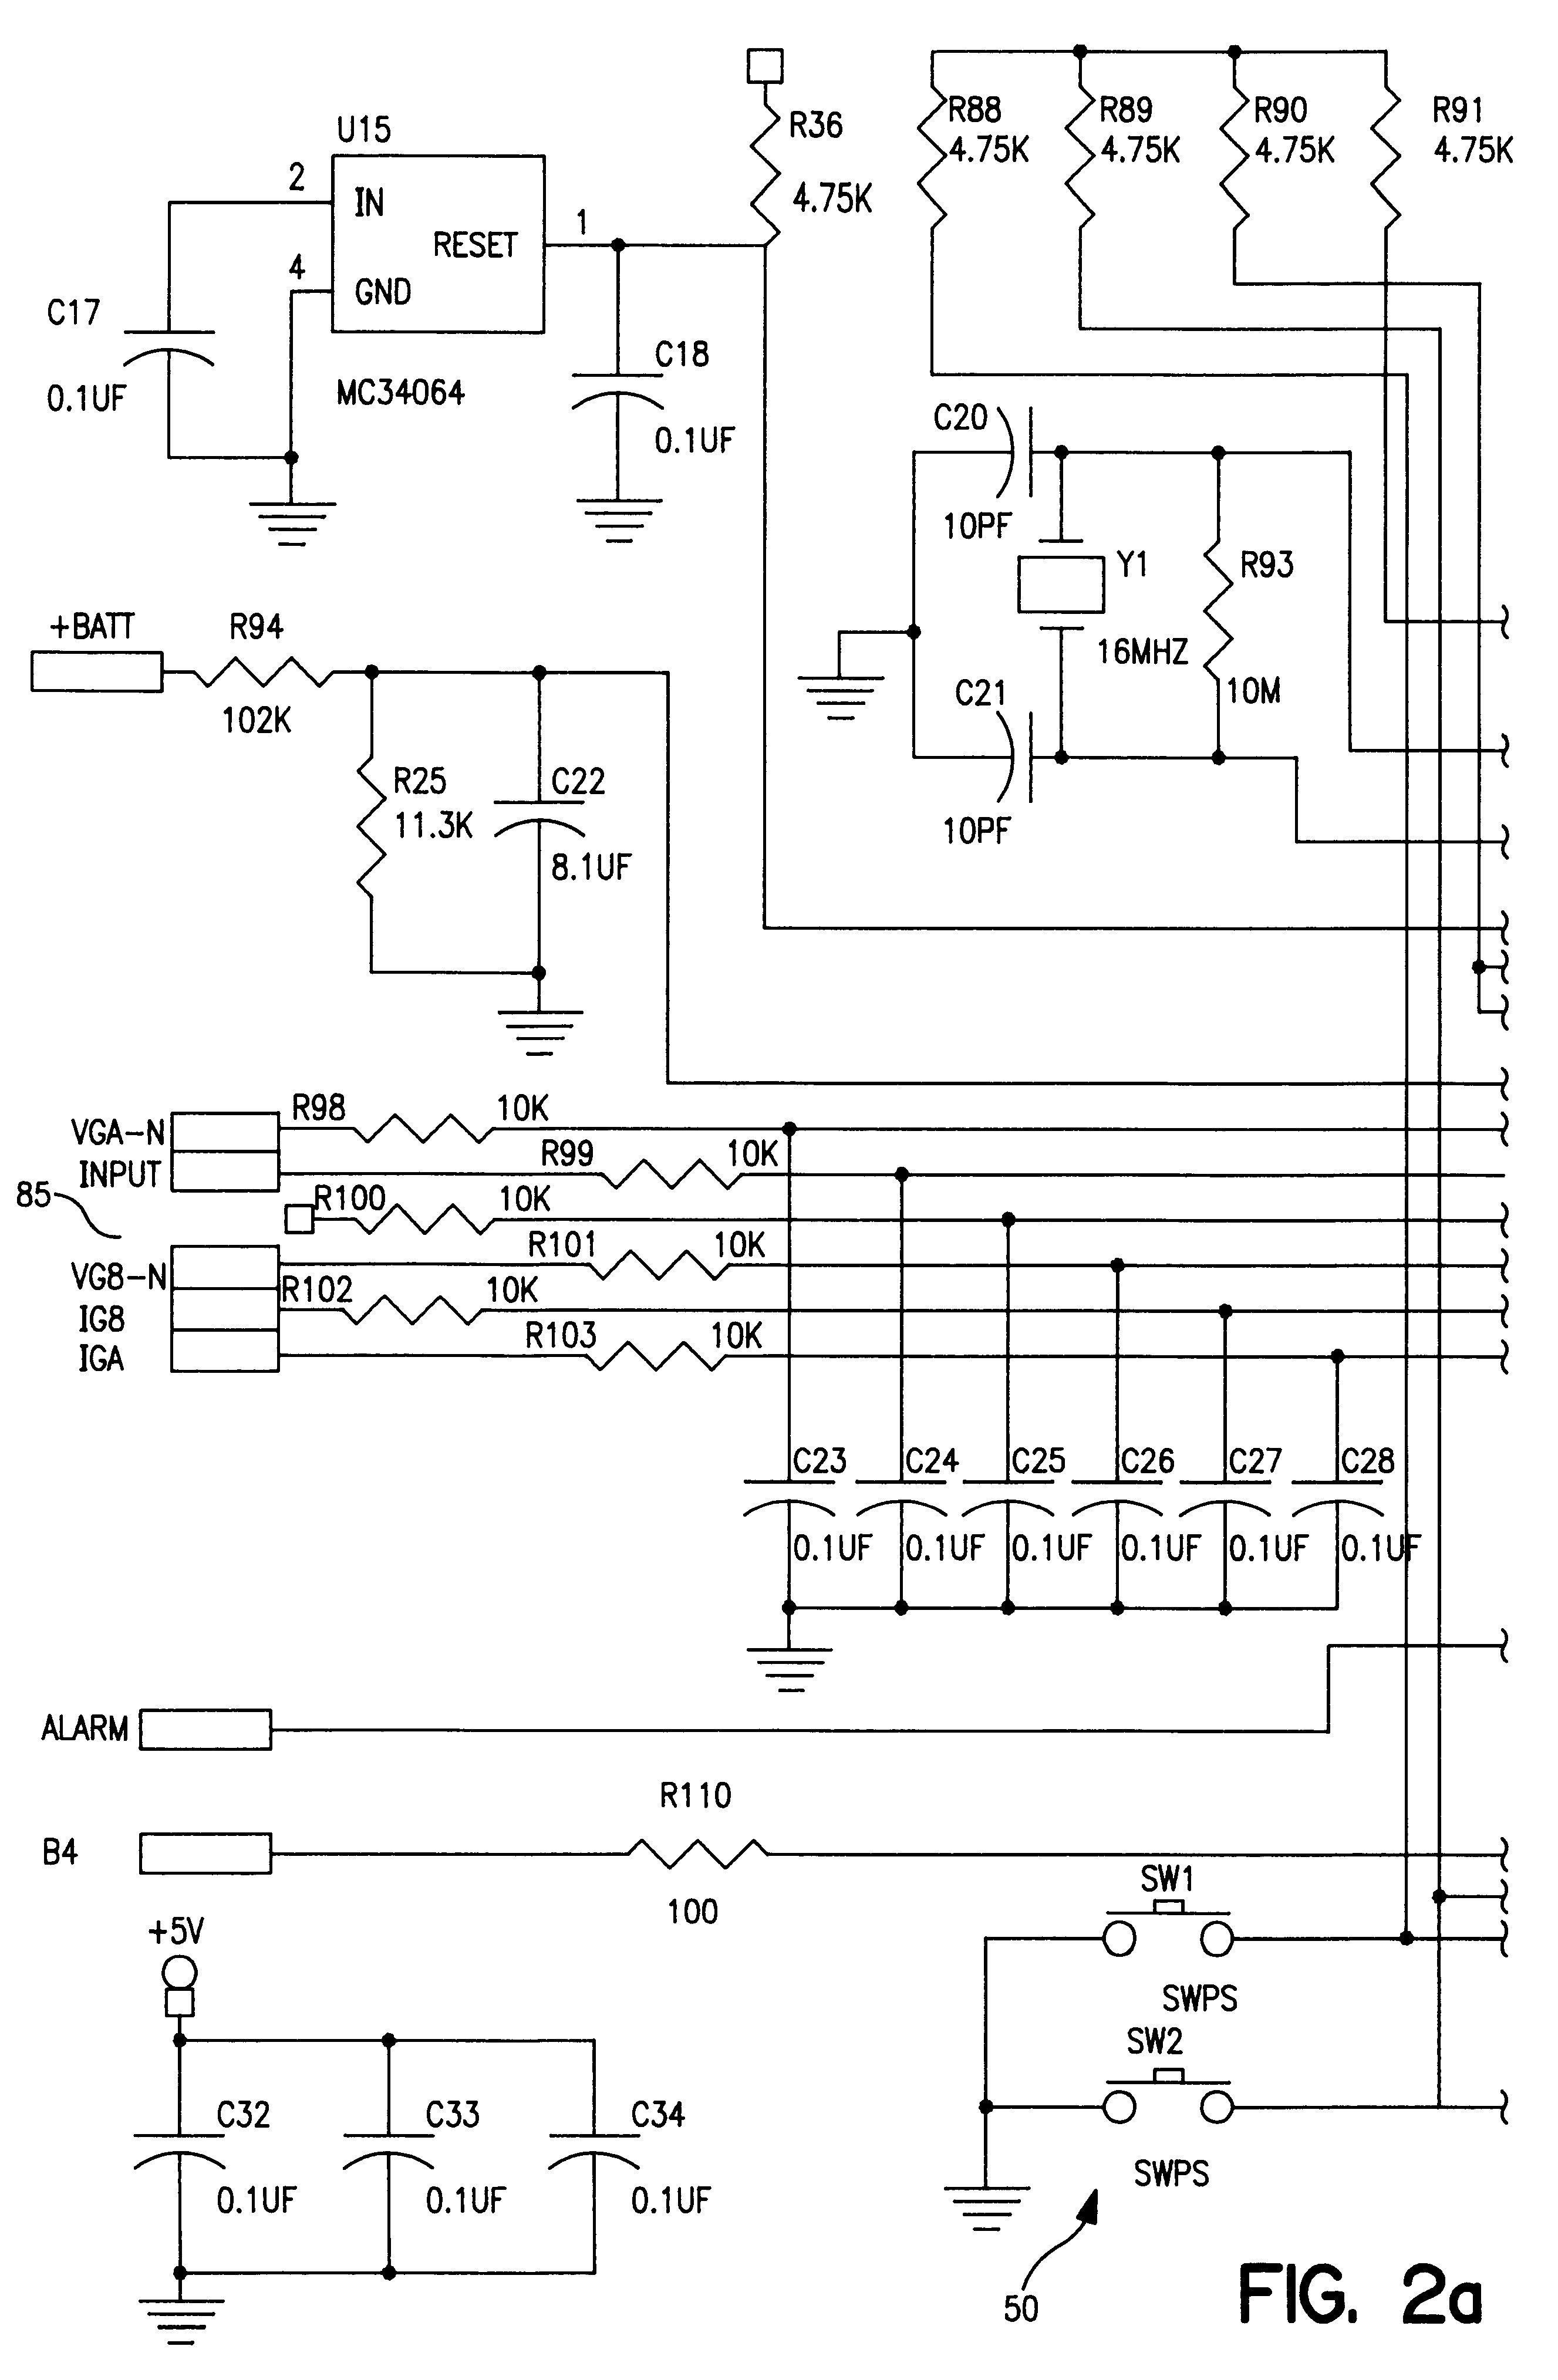 Wiring Diagram Standby Generator Diagram Diagramtemplate Diagramsample Tecnologia